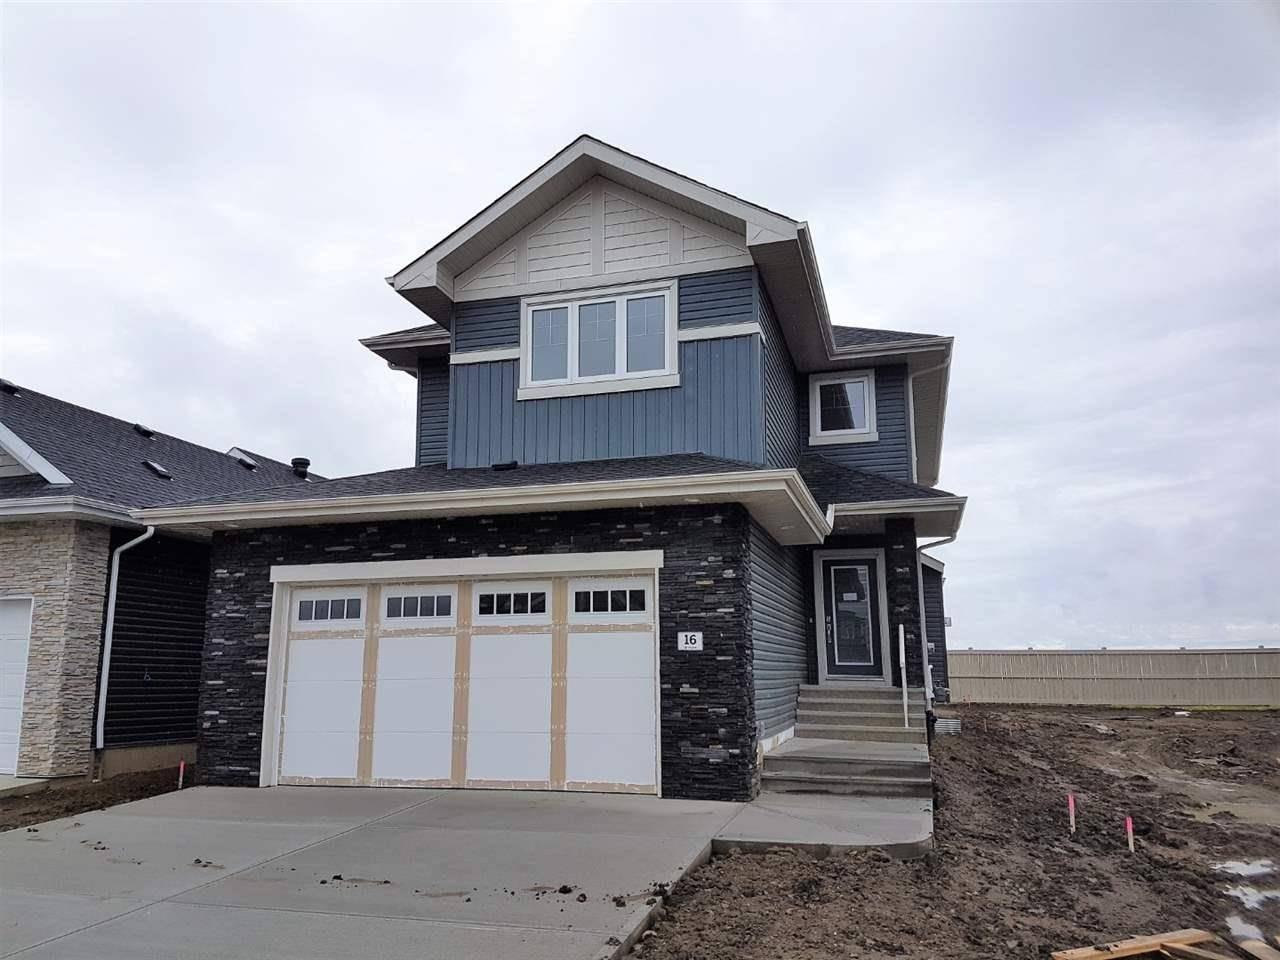 House for sale at 16 Edison Dr St. Albert Alberta - MLS: E4178685